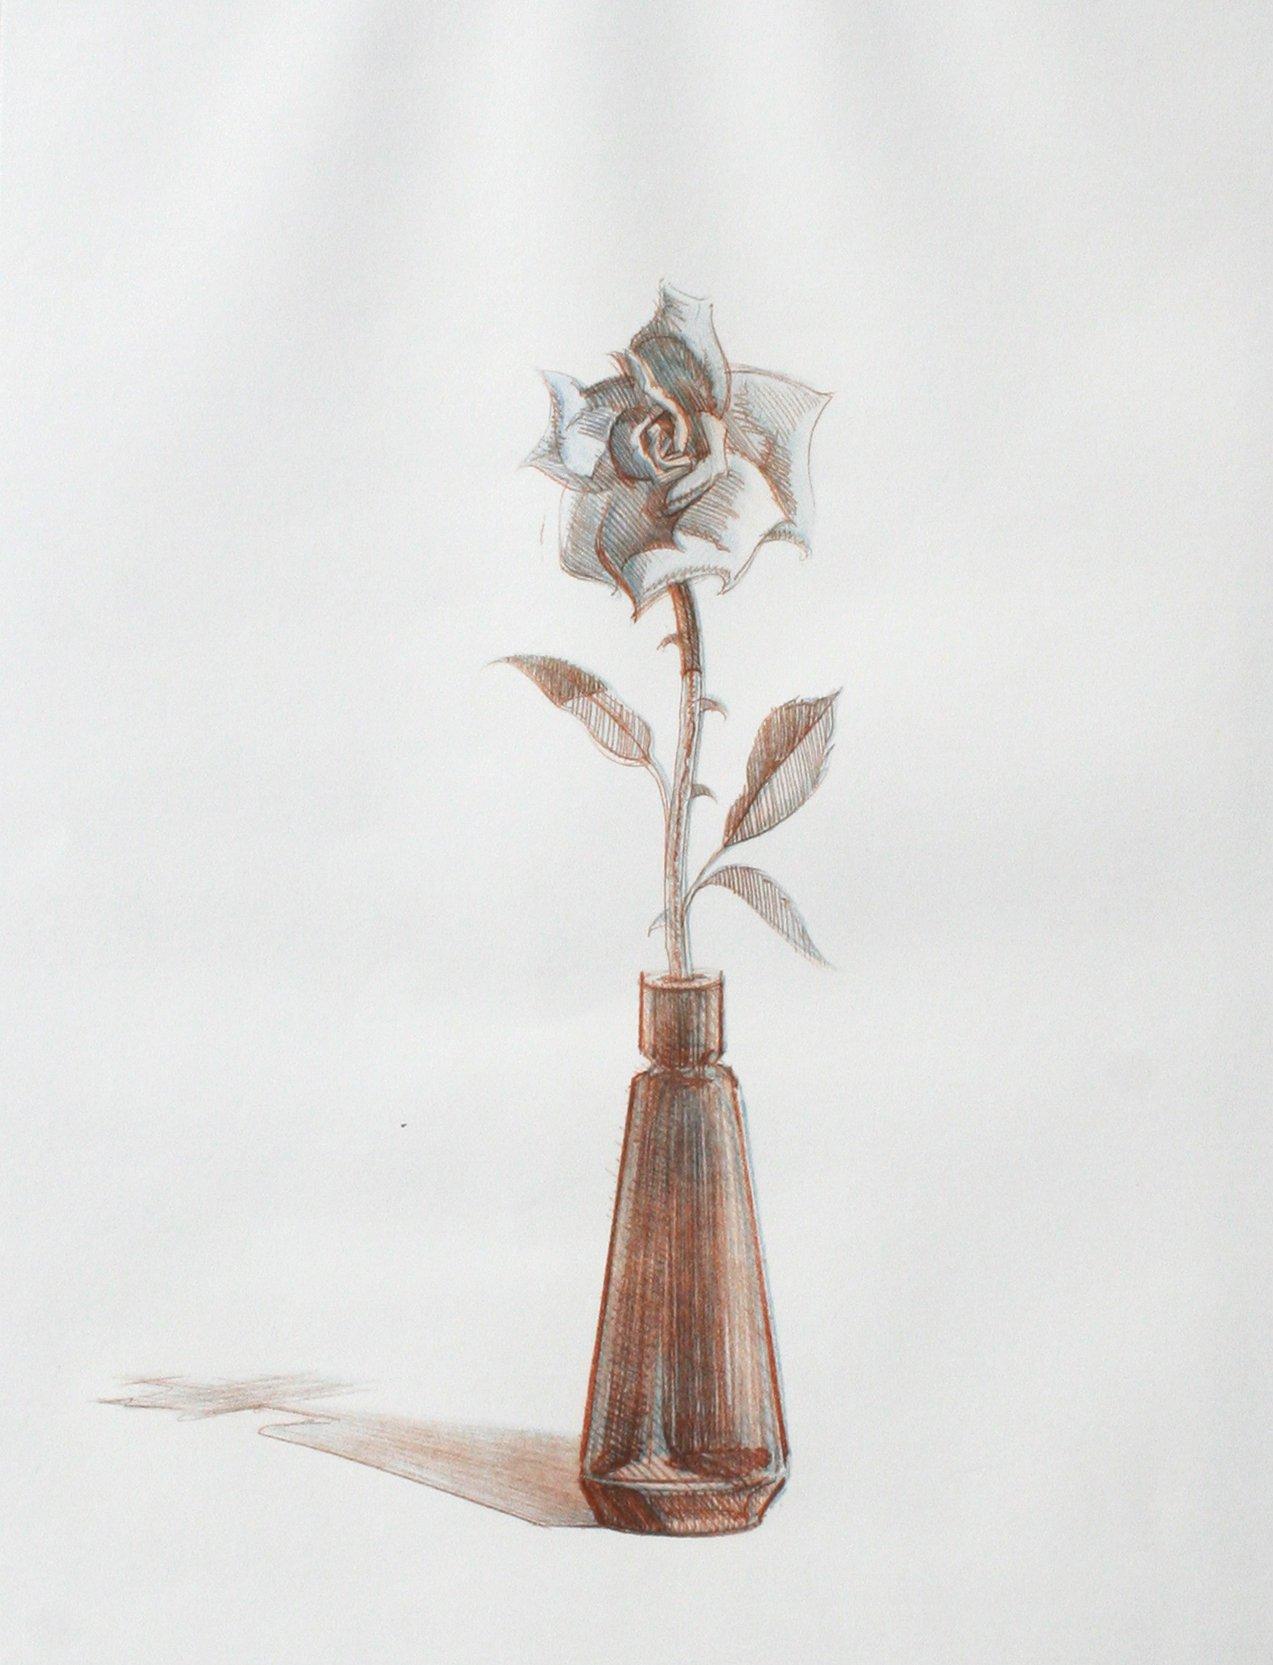 Wayne Thiebaud, Rose